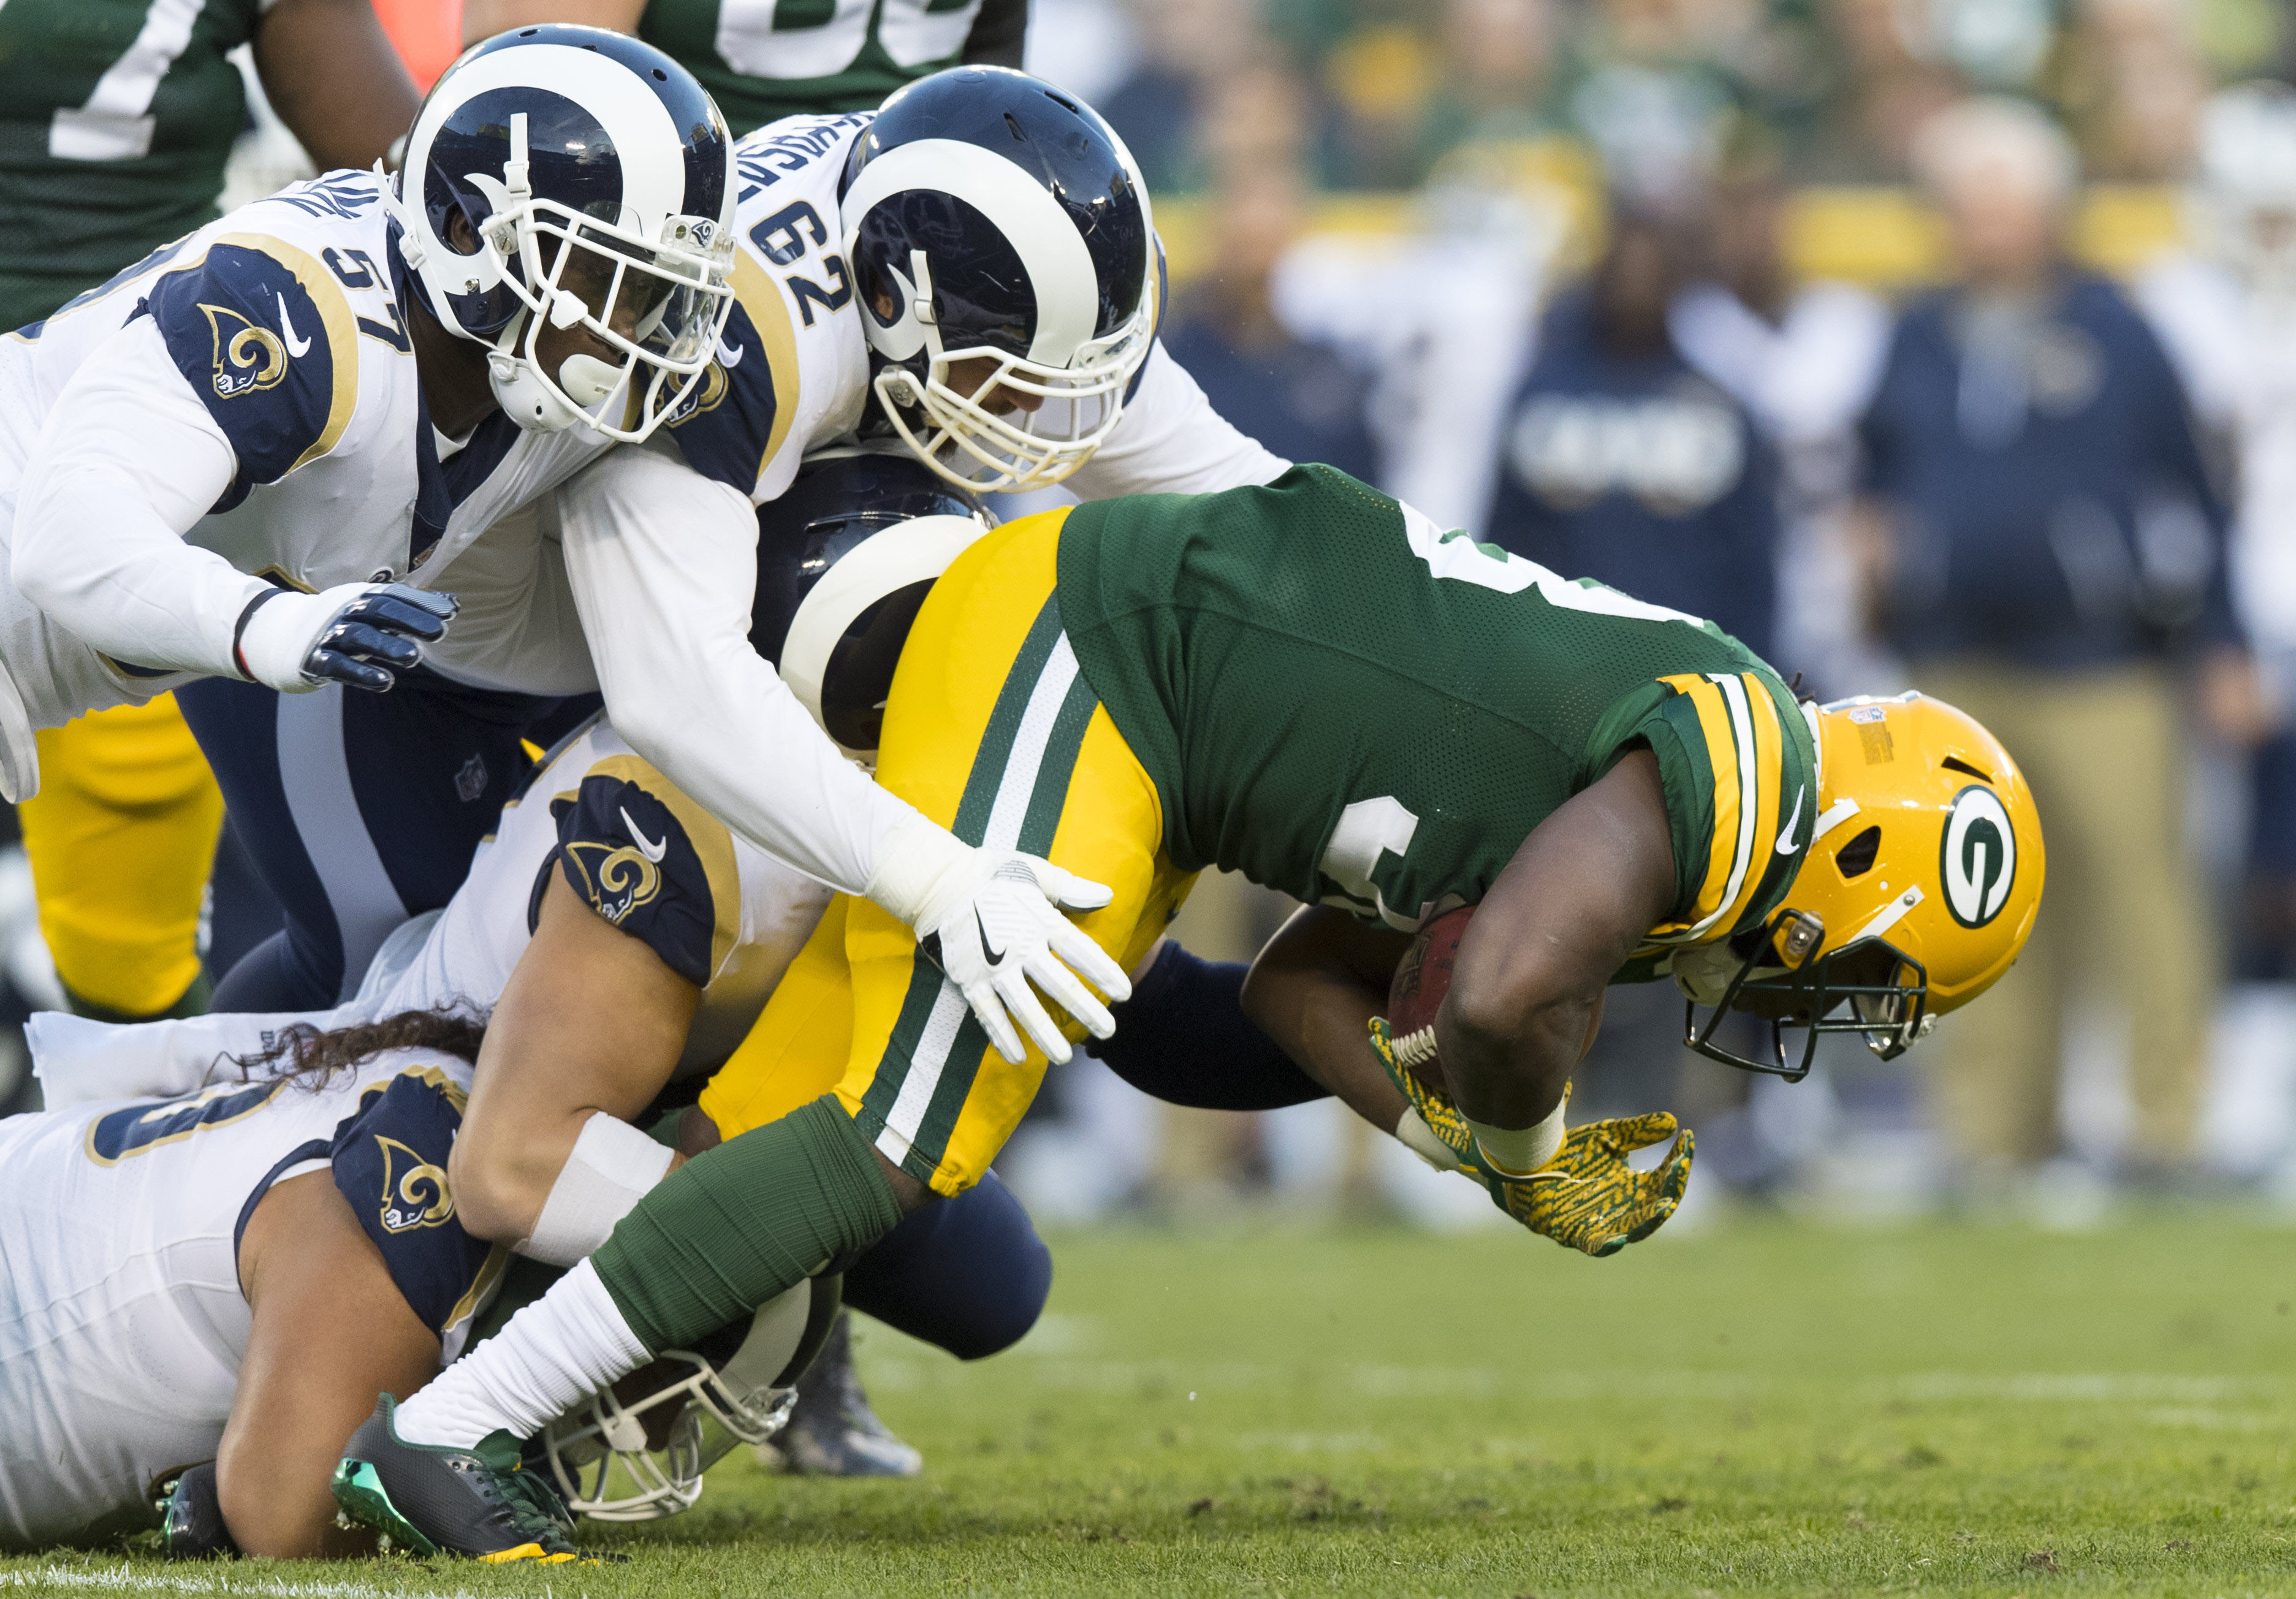 NFL: Los Angeles Rams at Green Bay Packers